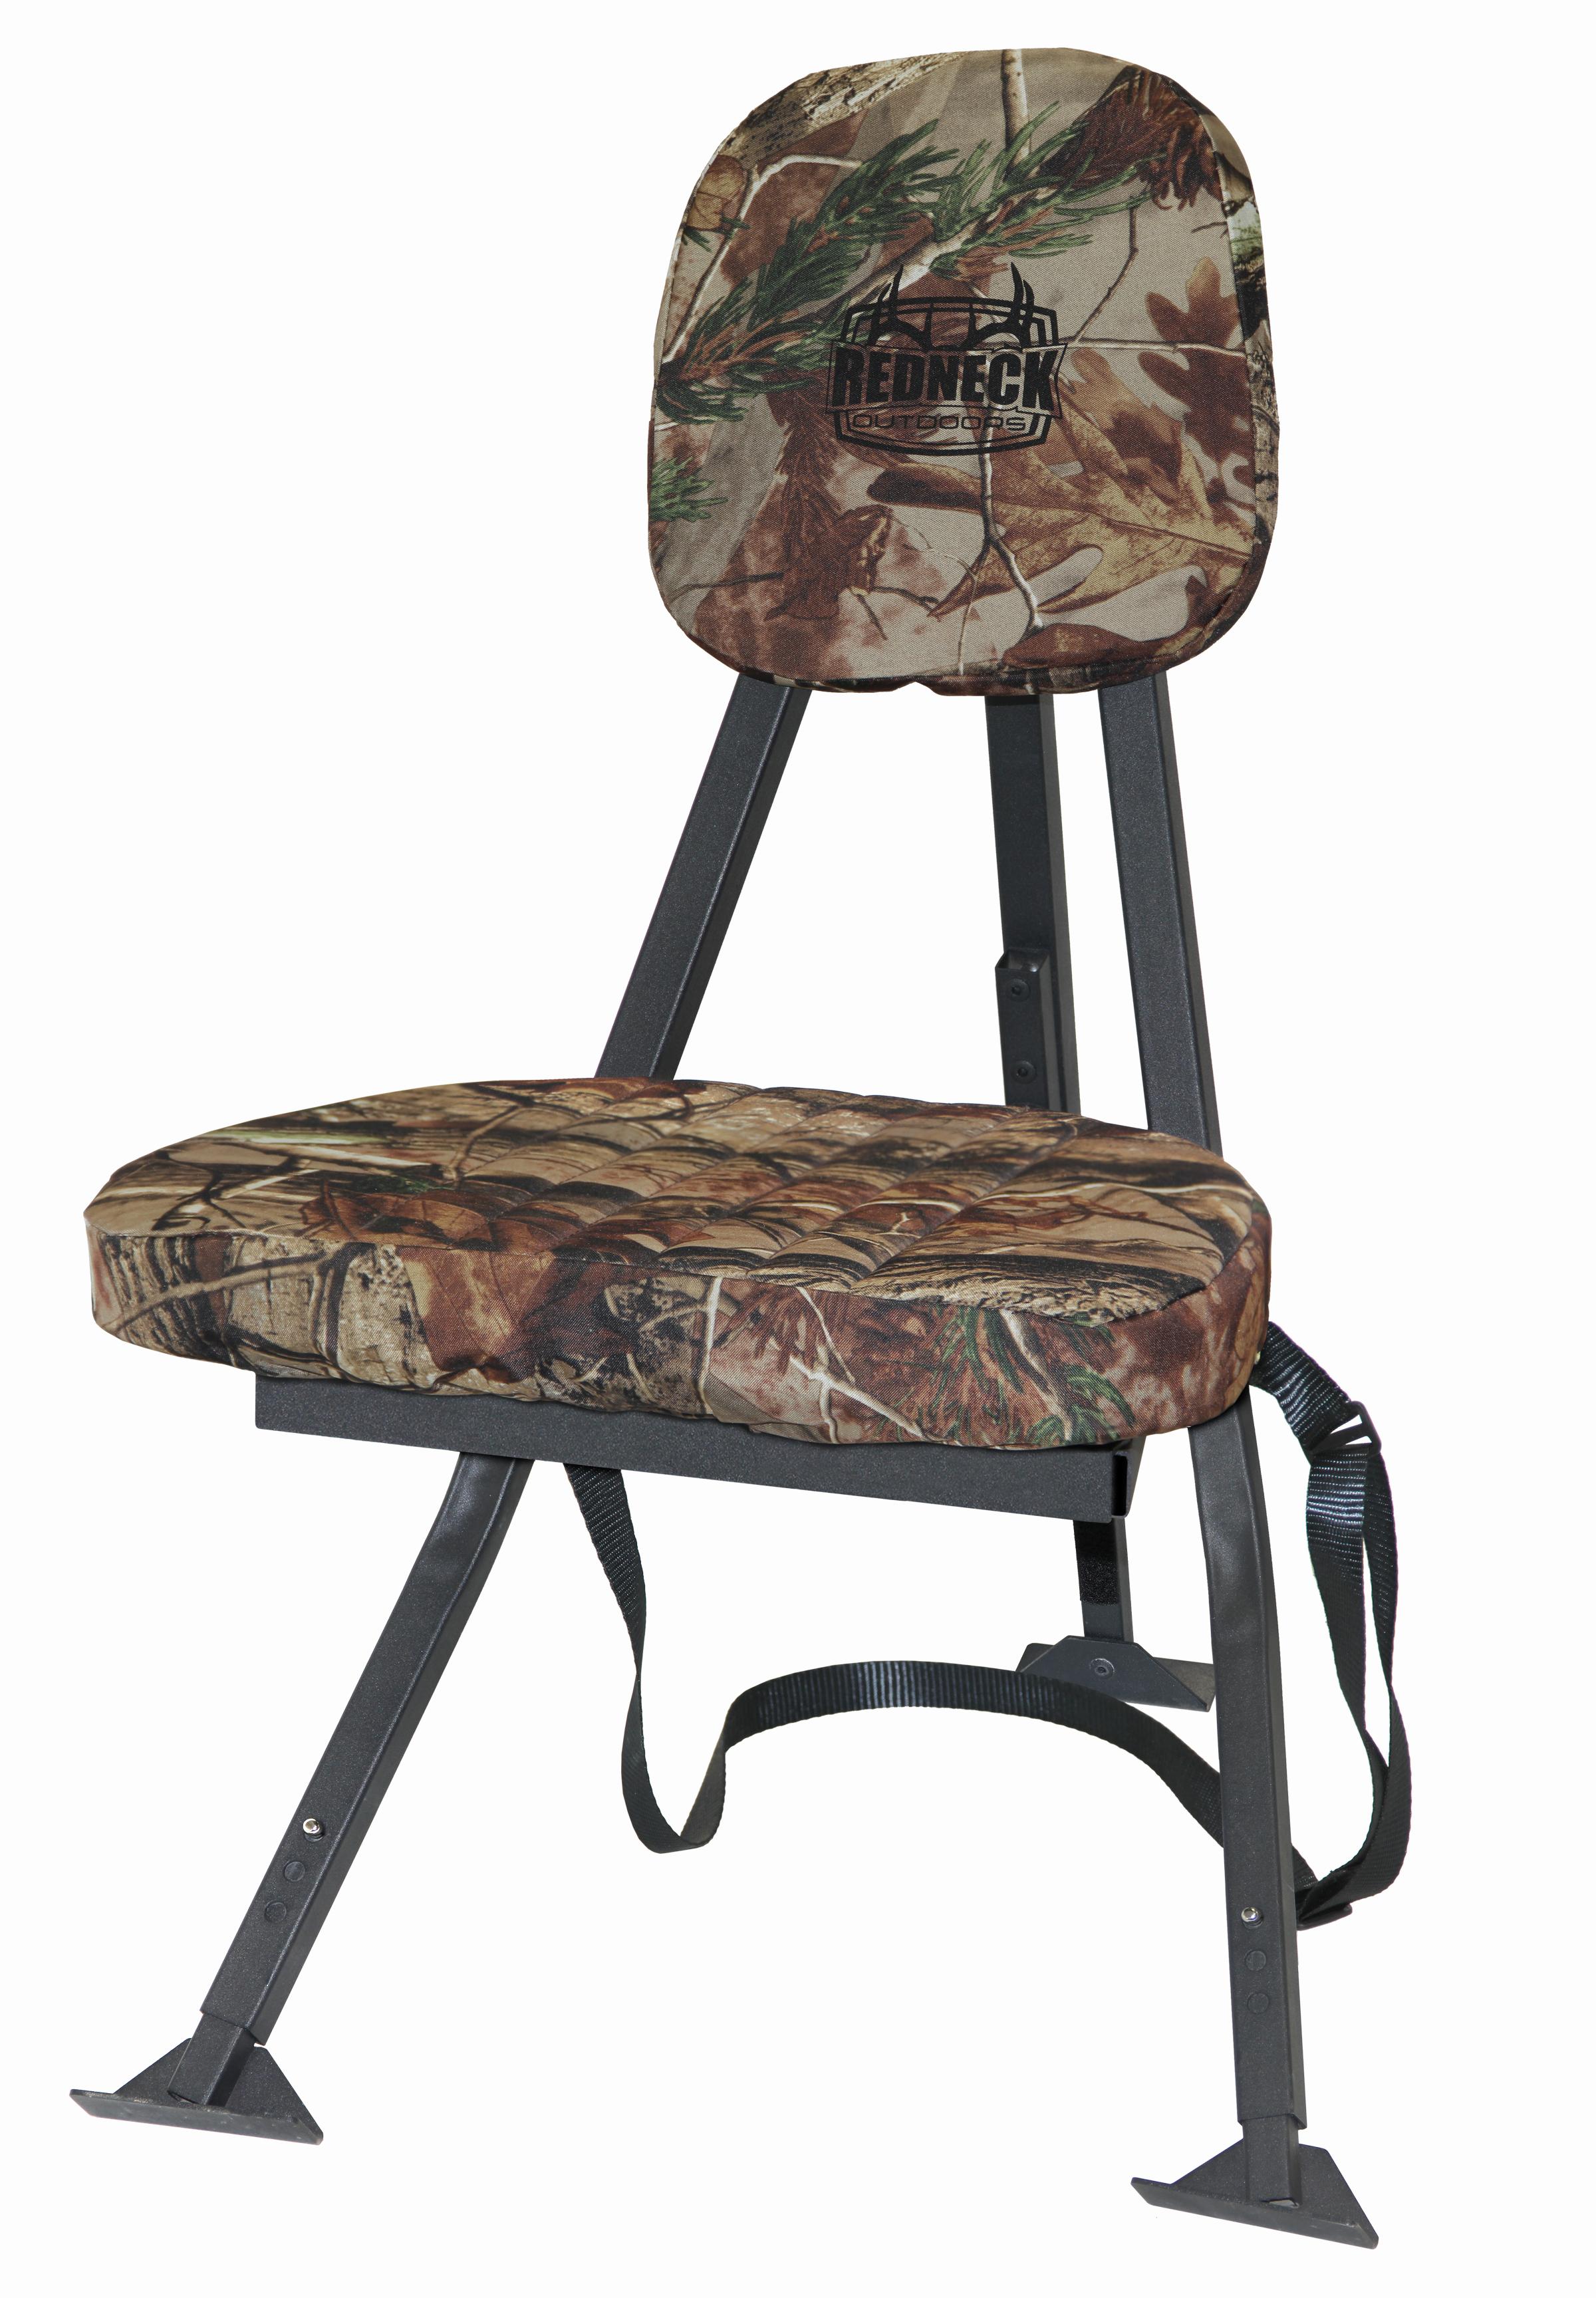 Rednecks AllNew Portable Hunting Chair  Hunting News